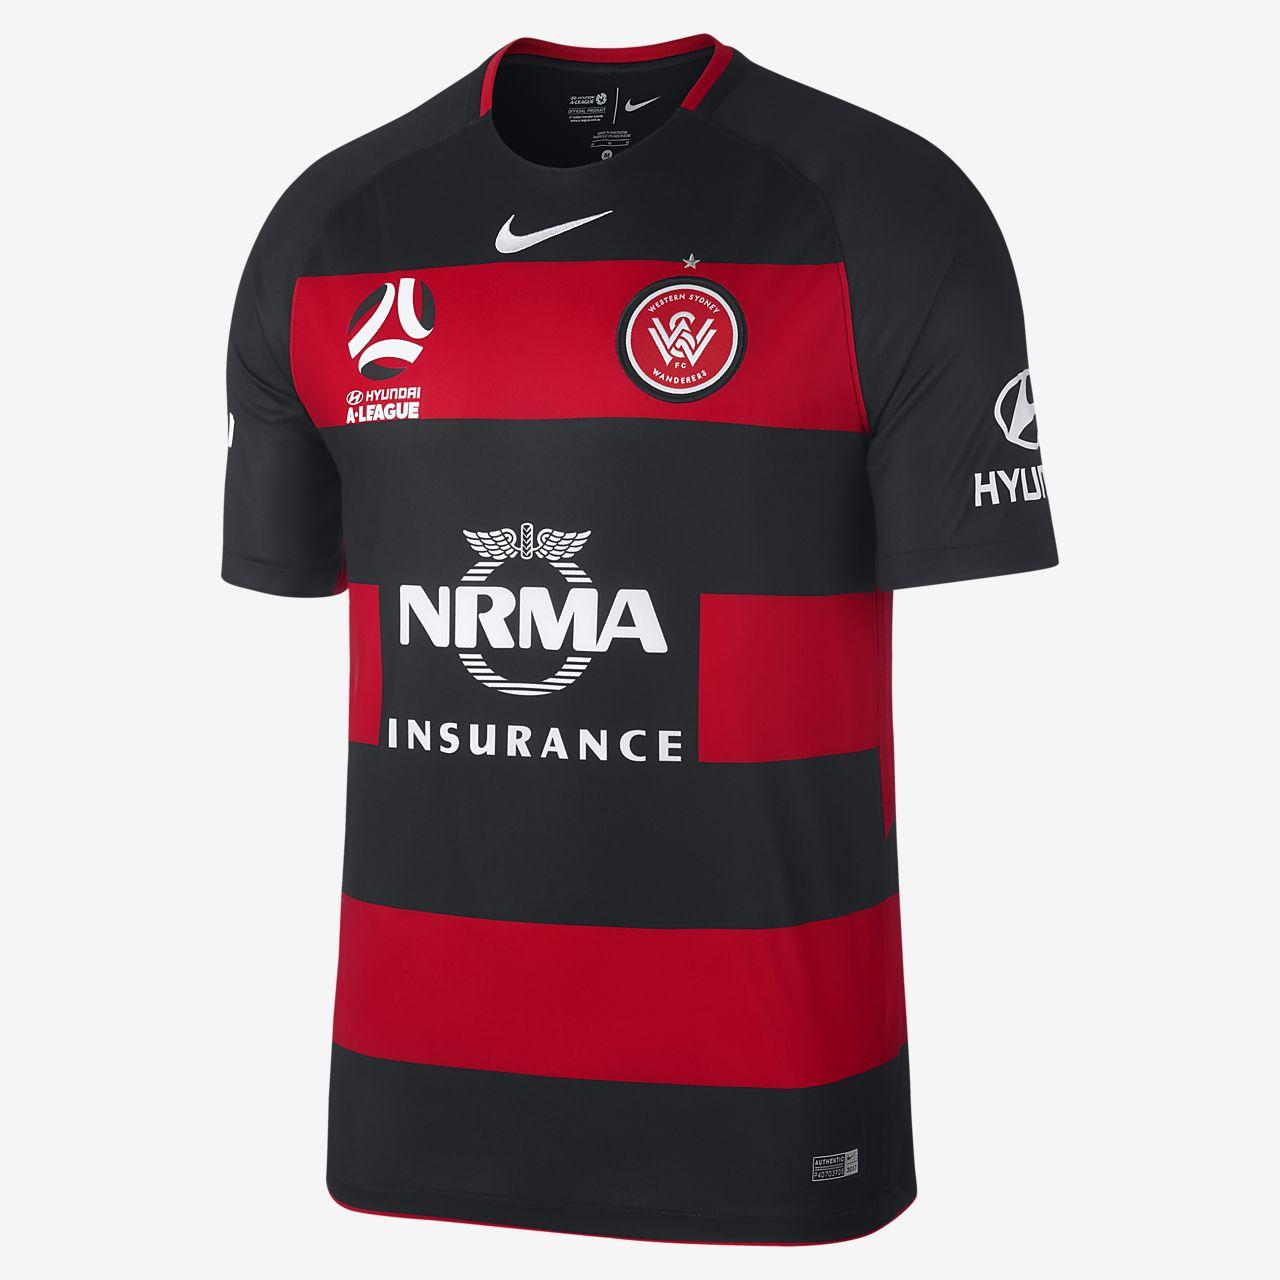 ... temporada Camiseta de fútbol para hombre Western Sydney FC de local para  aficionados ff48cd1b14af5